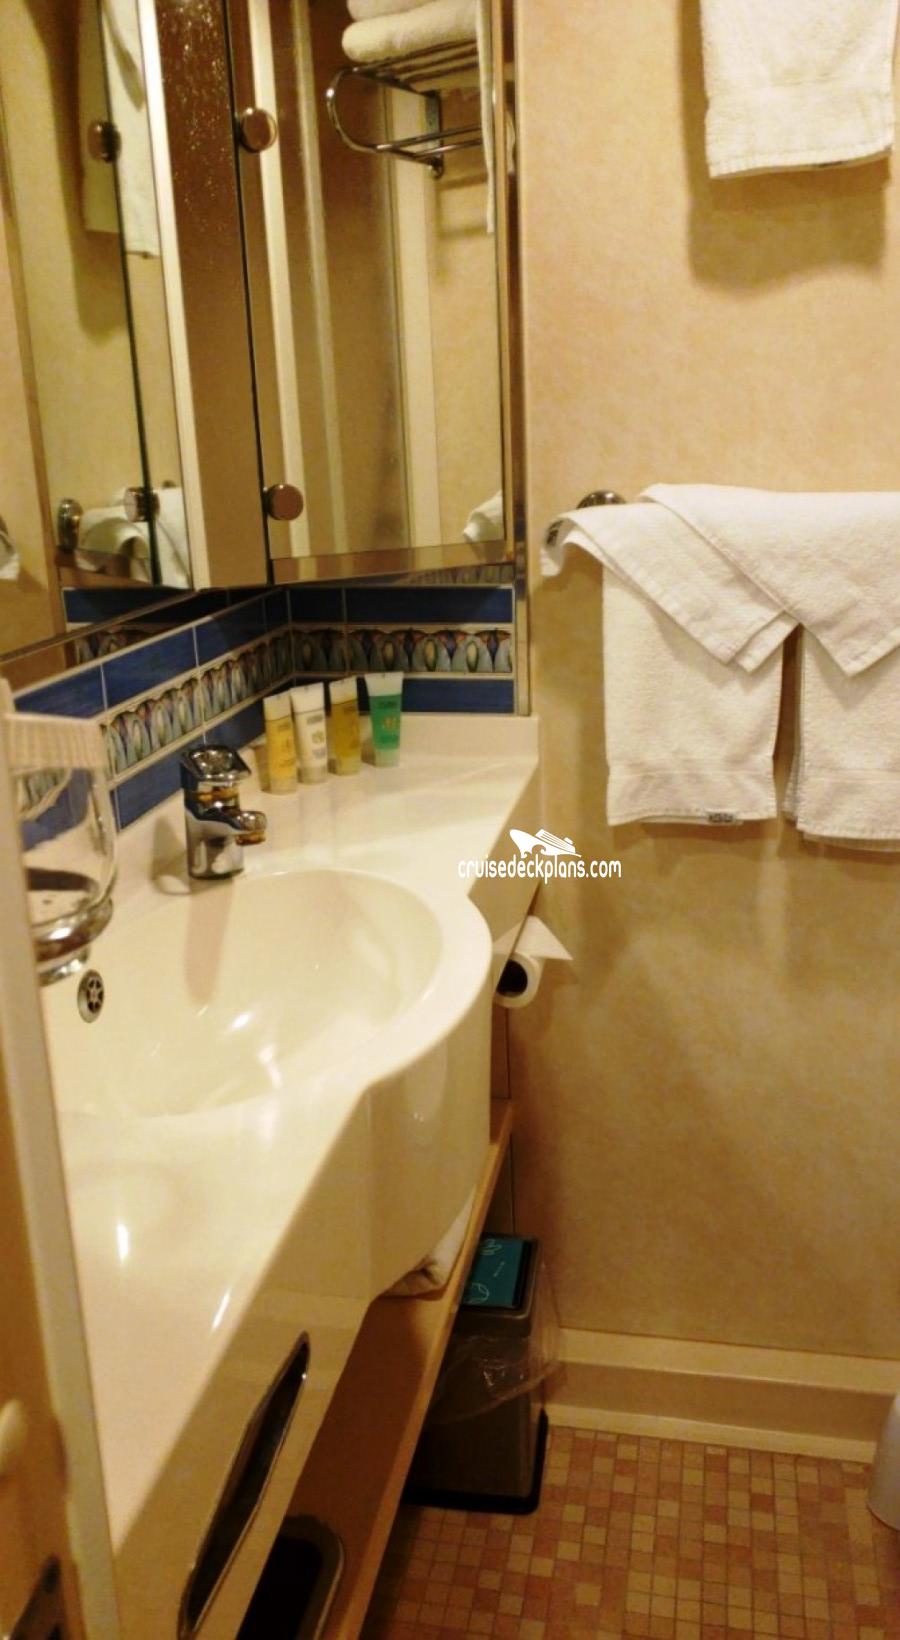 Three Bedroom Suite Disneyland Hotel Layout: Adventure Of The Seas Grand Suite